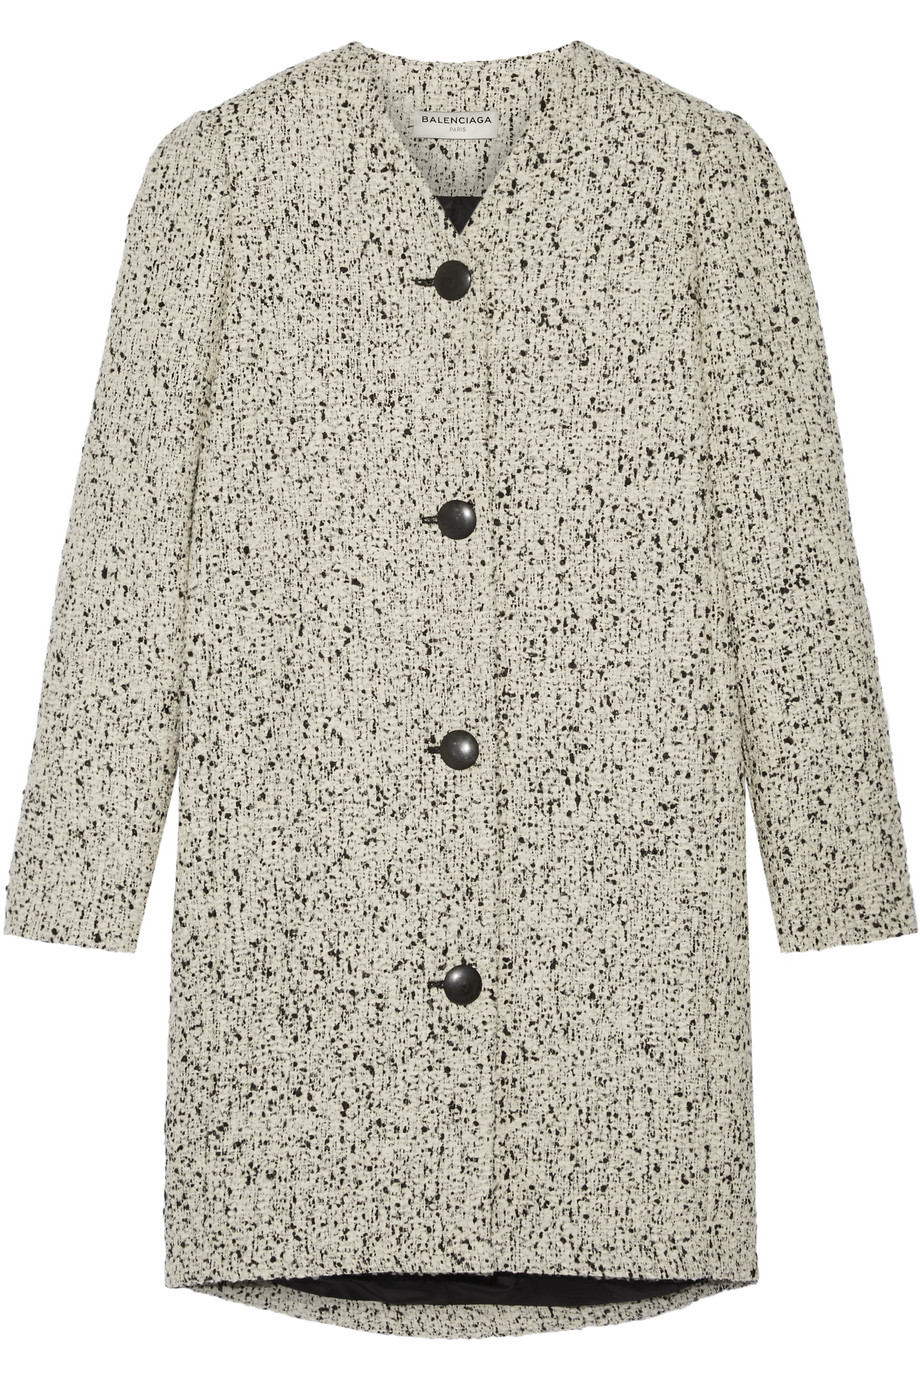 Balenciaga Wool-Blend Bouclé-Tweed Coat, Ecru, Women's, Size: 36